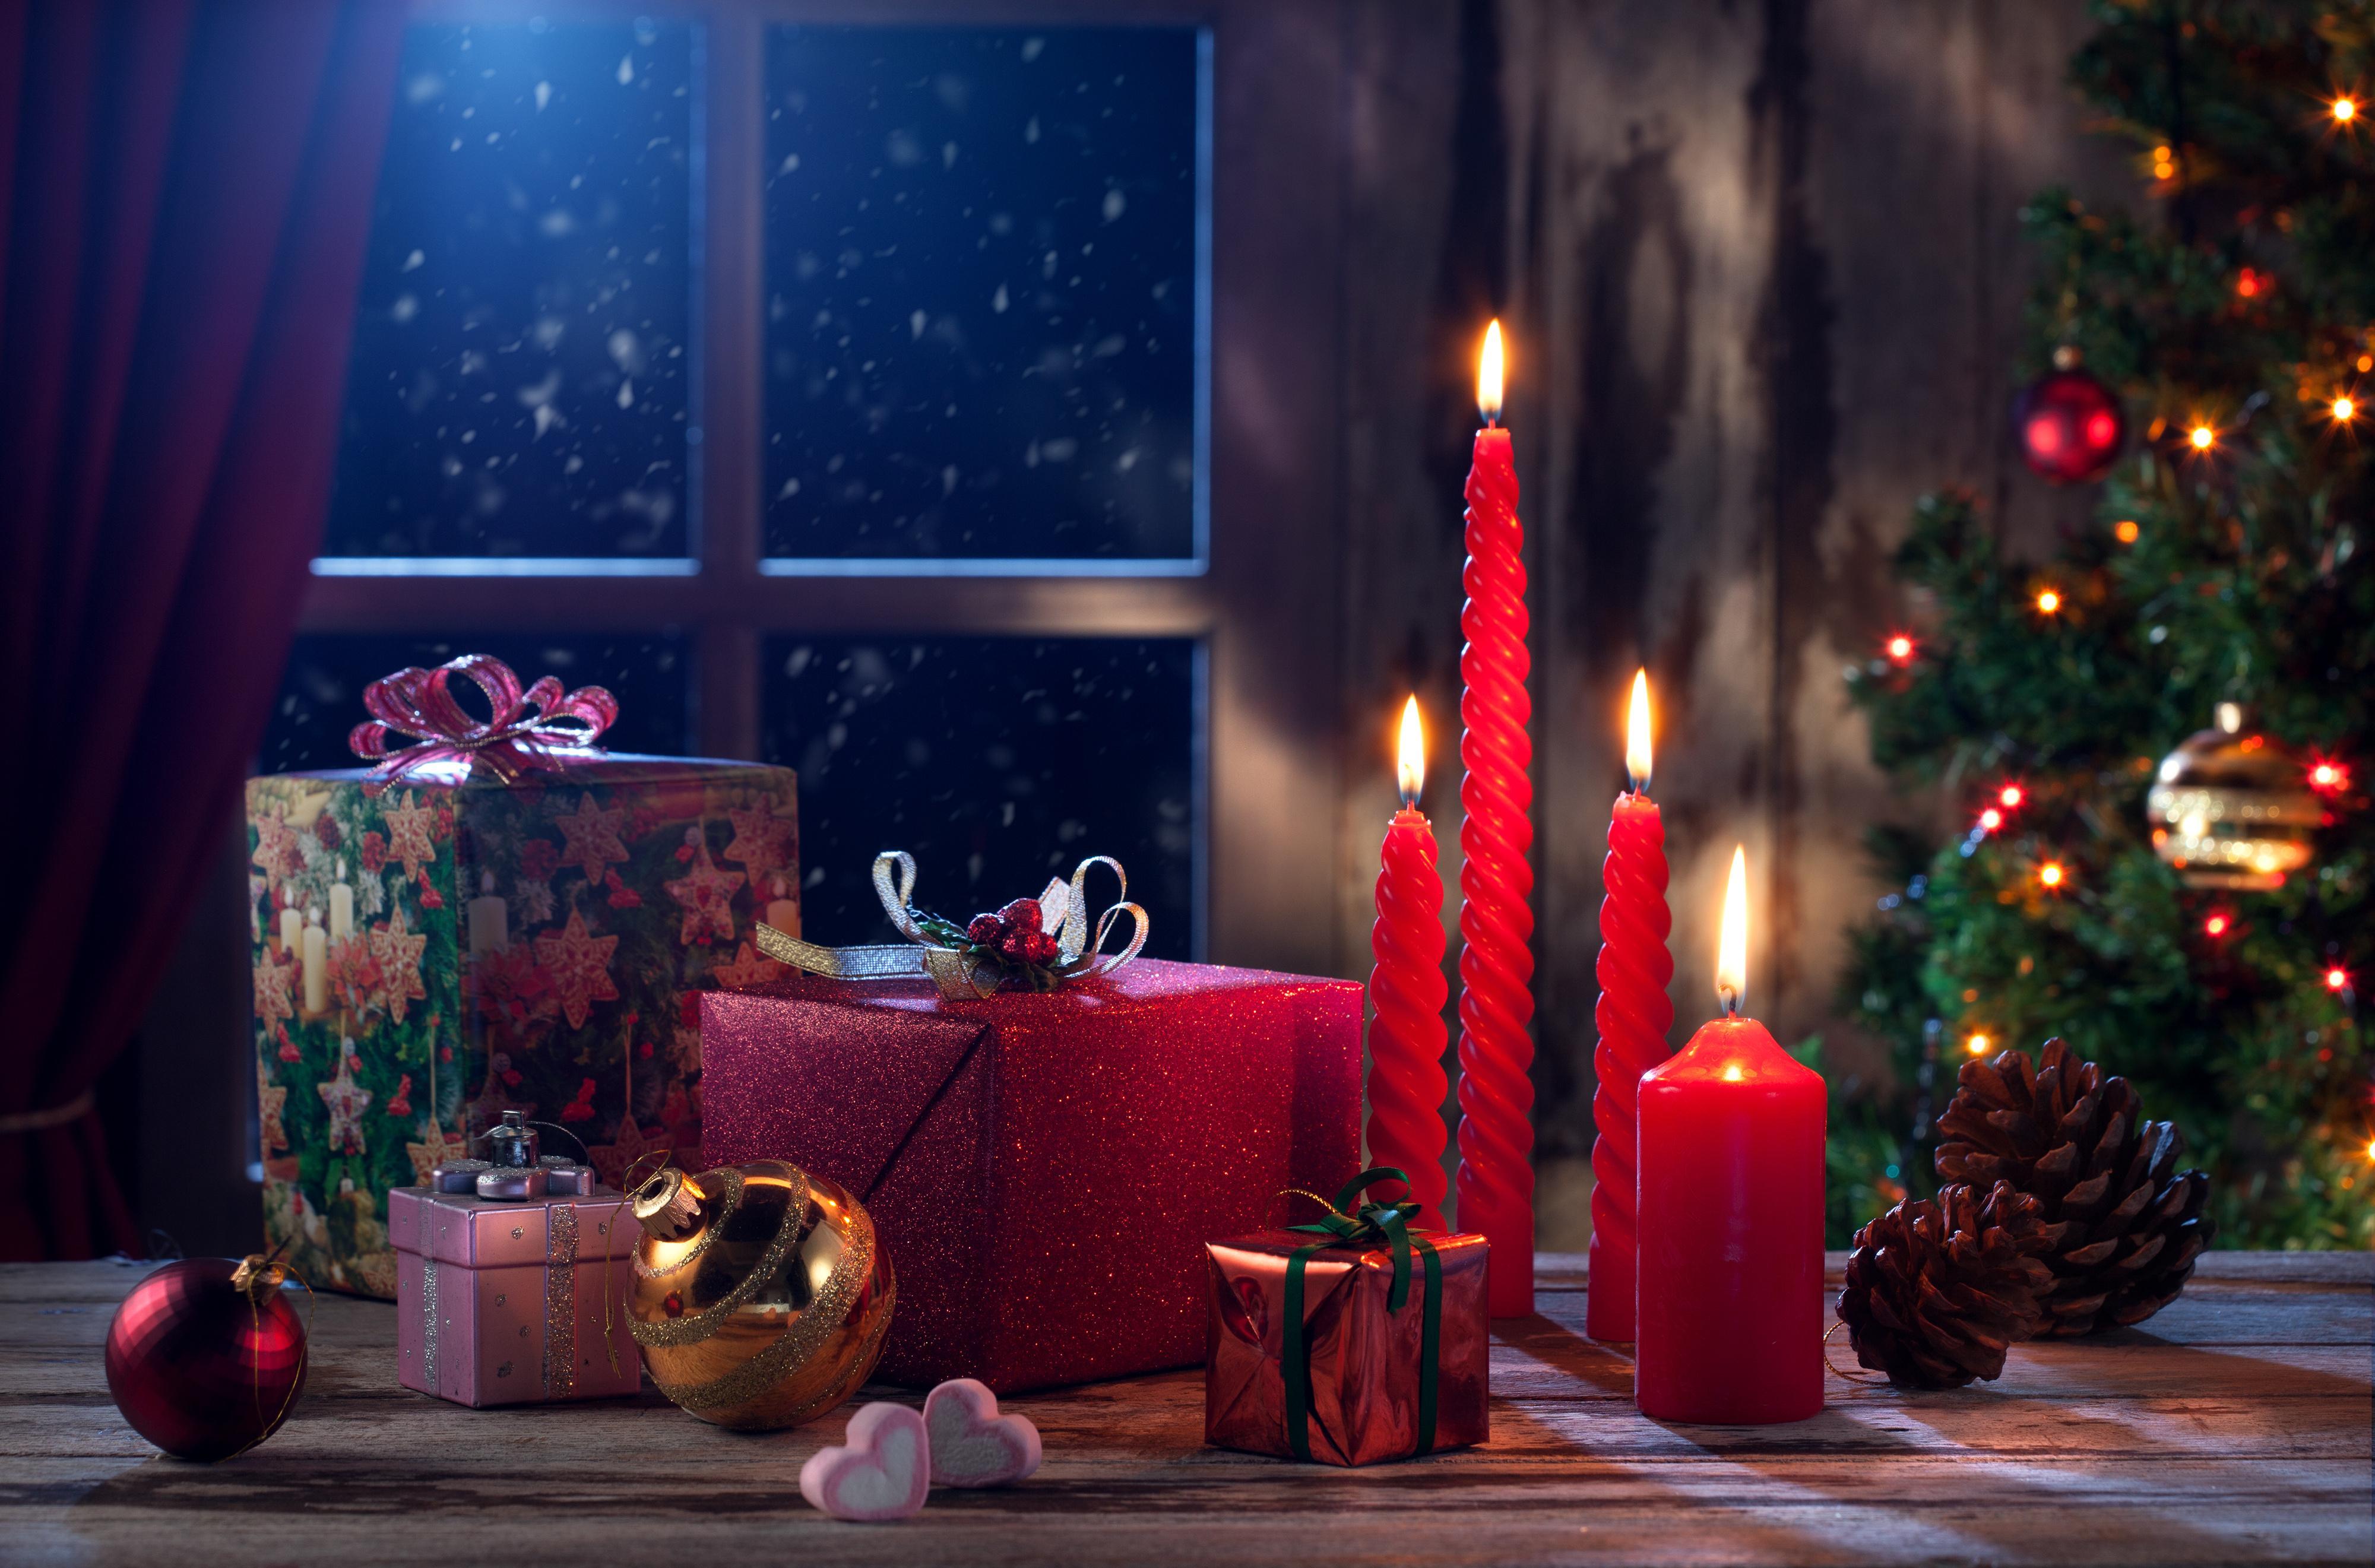 рождество, елка, игрушки, подарки без смс